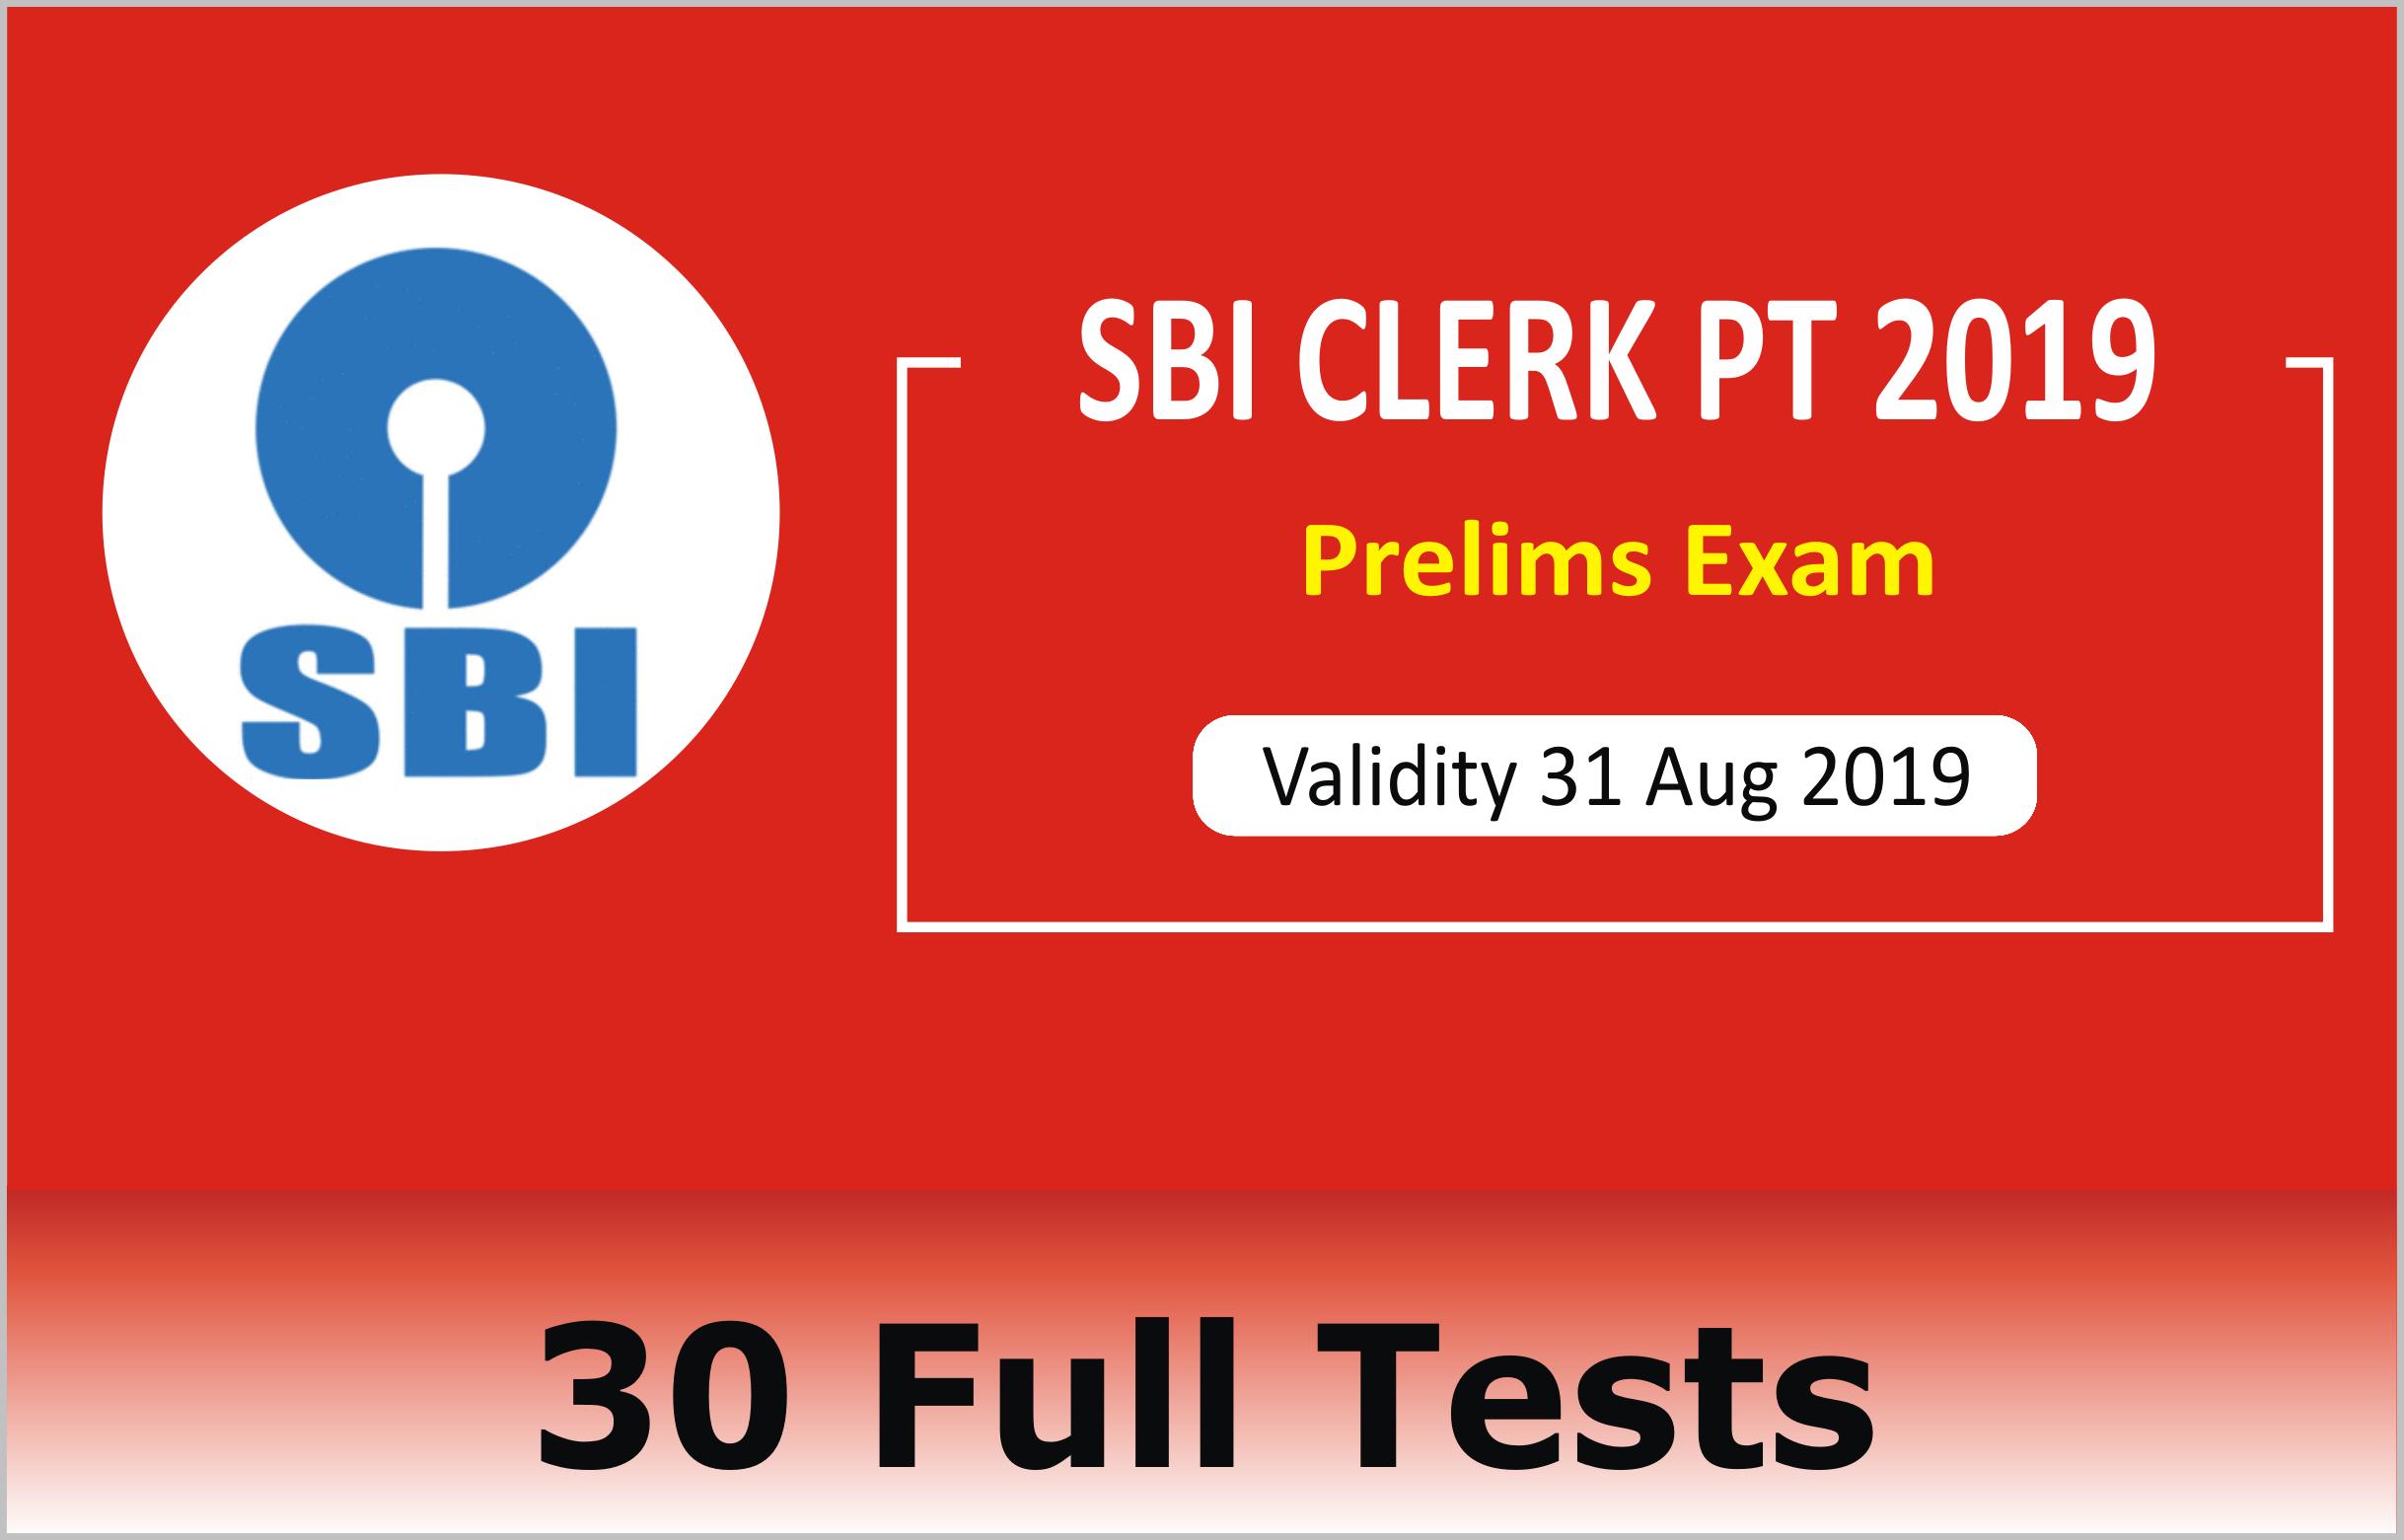 SBI CLERK PT 2019